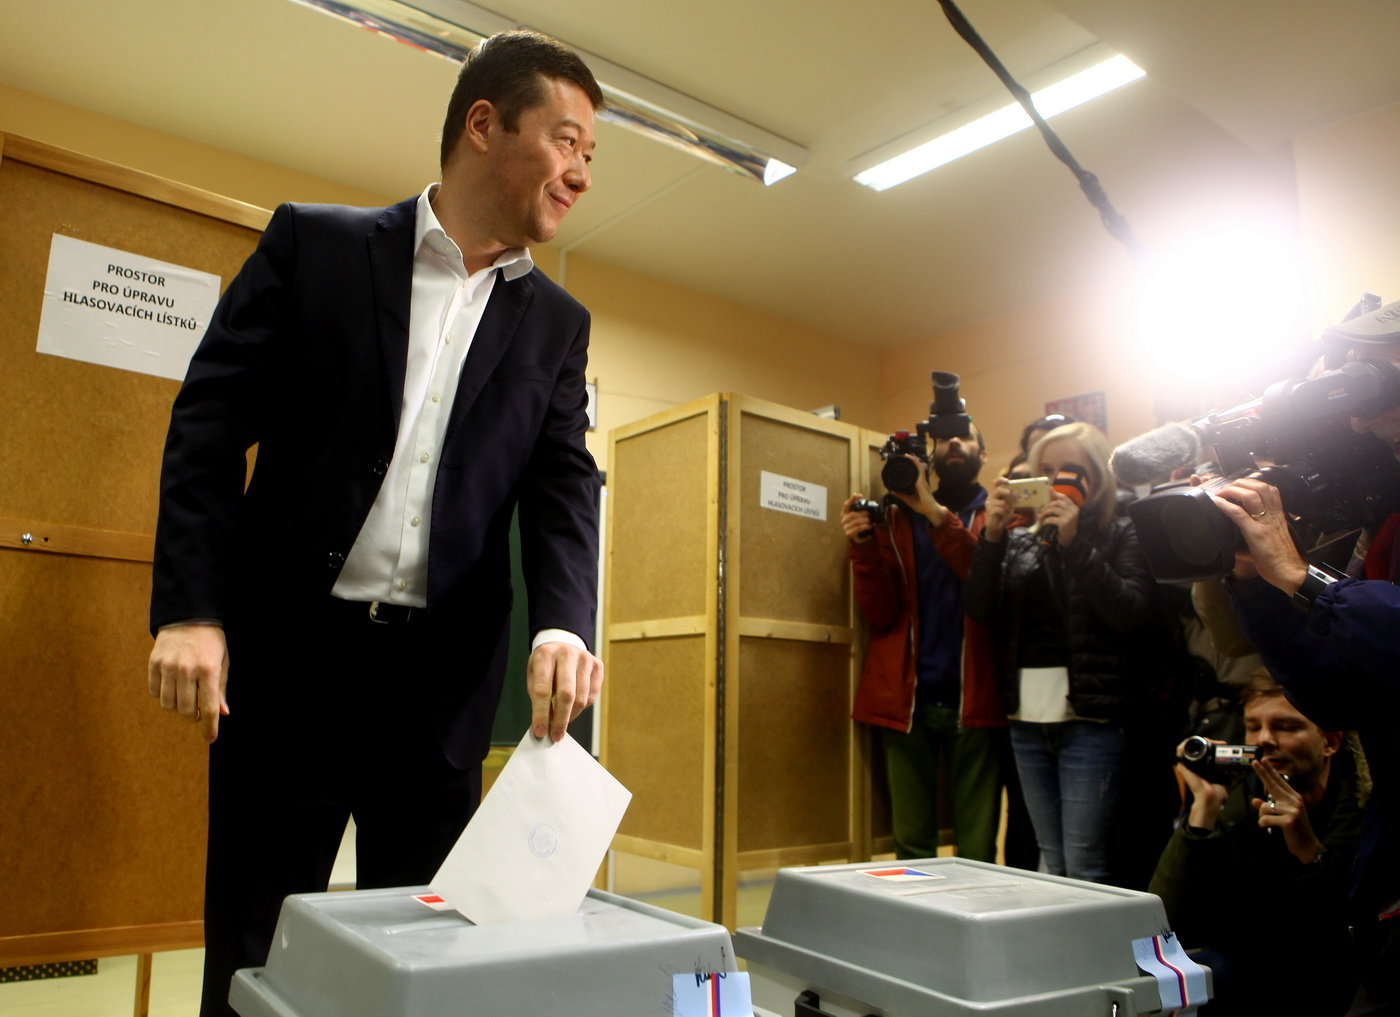 Tomio Okamura hlasuje ve volbách do Sněmovny